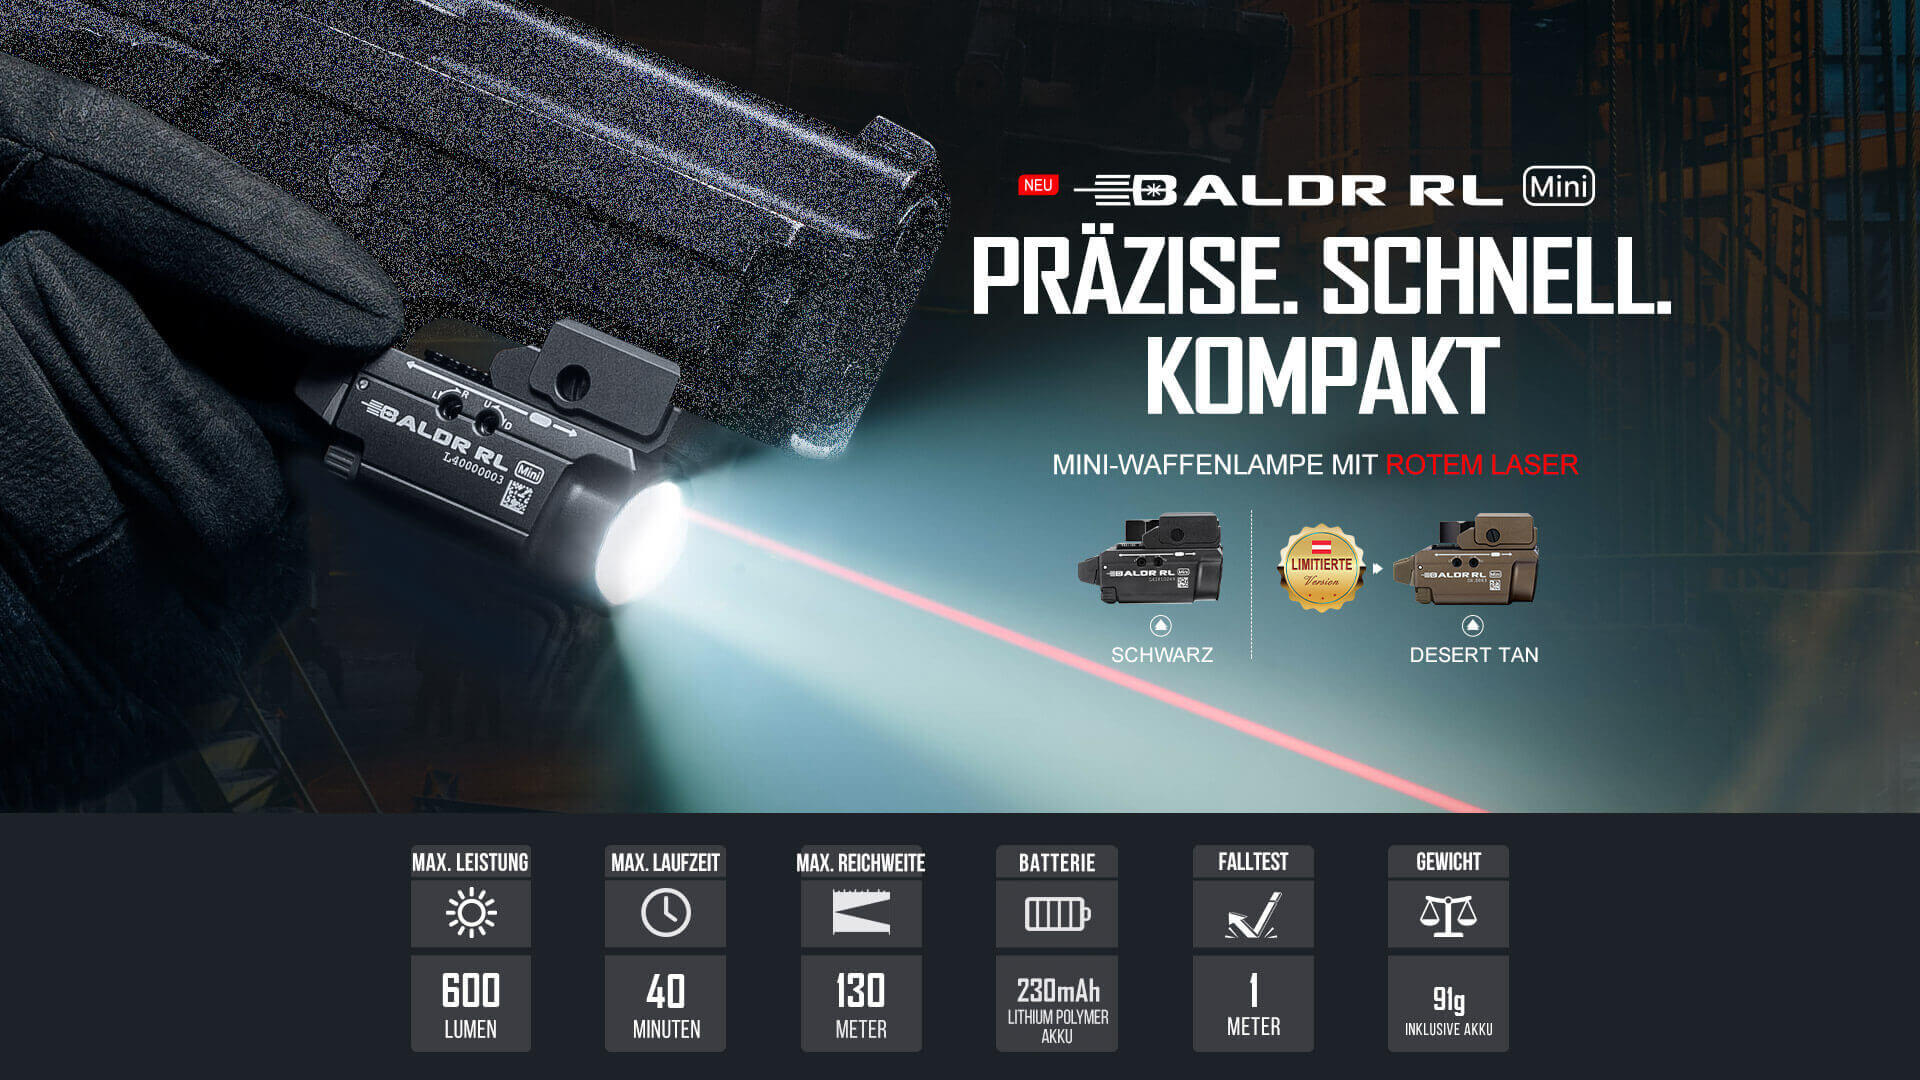 Die Baldr RL Mini ist die rote Laser Version der Baldr Mini